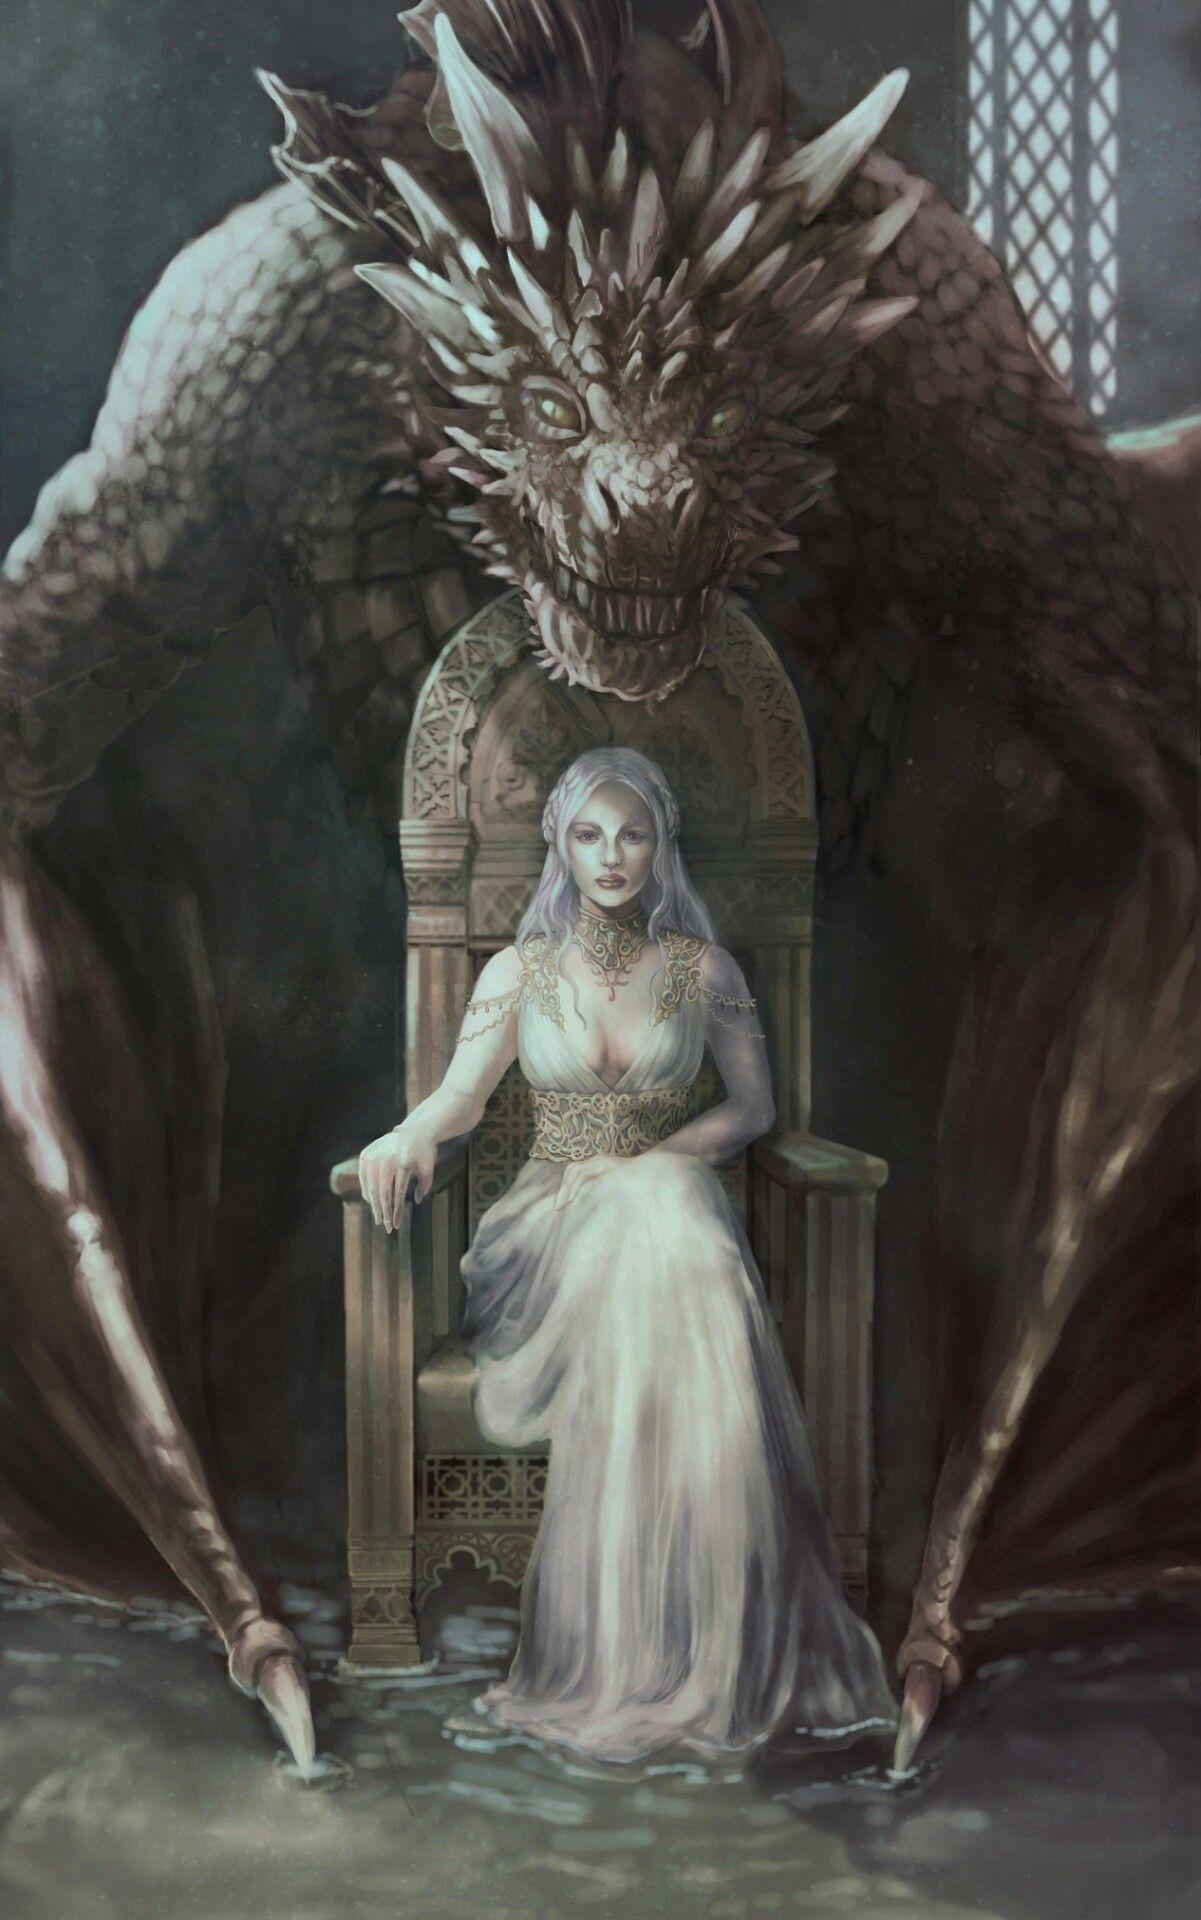 Dragons game of thrones colors - Game Of Thrones Fanart Daenerys Targaryen Mother Of Dragons